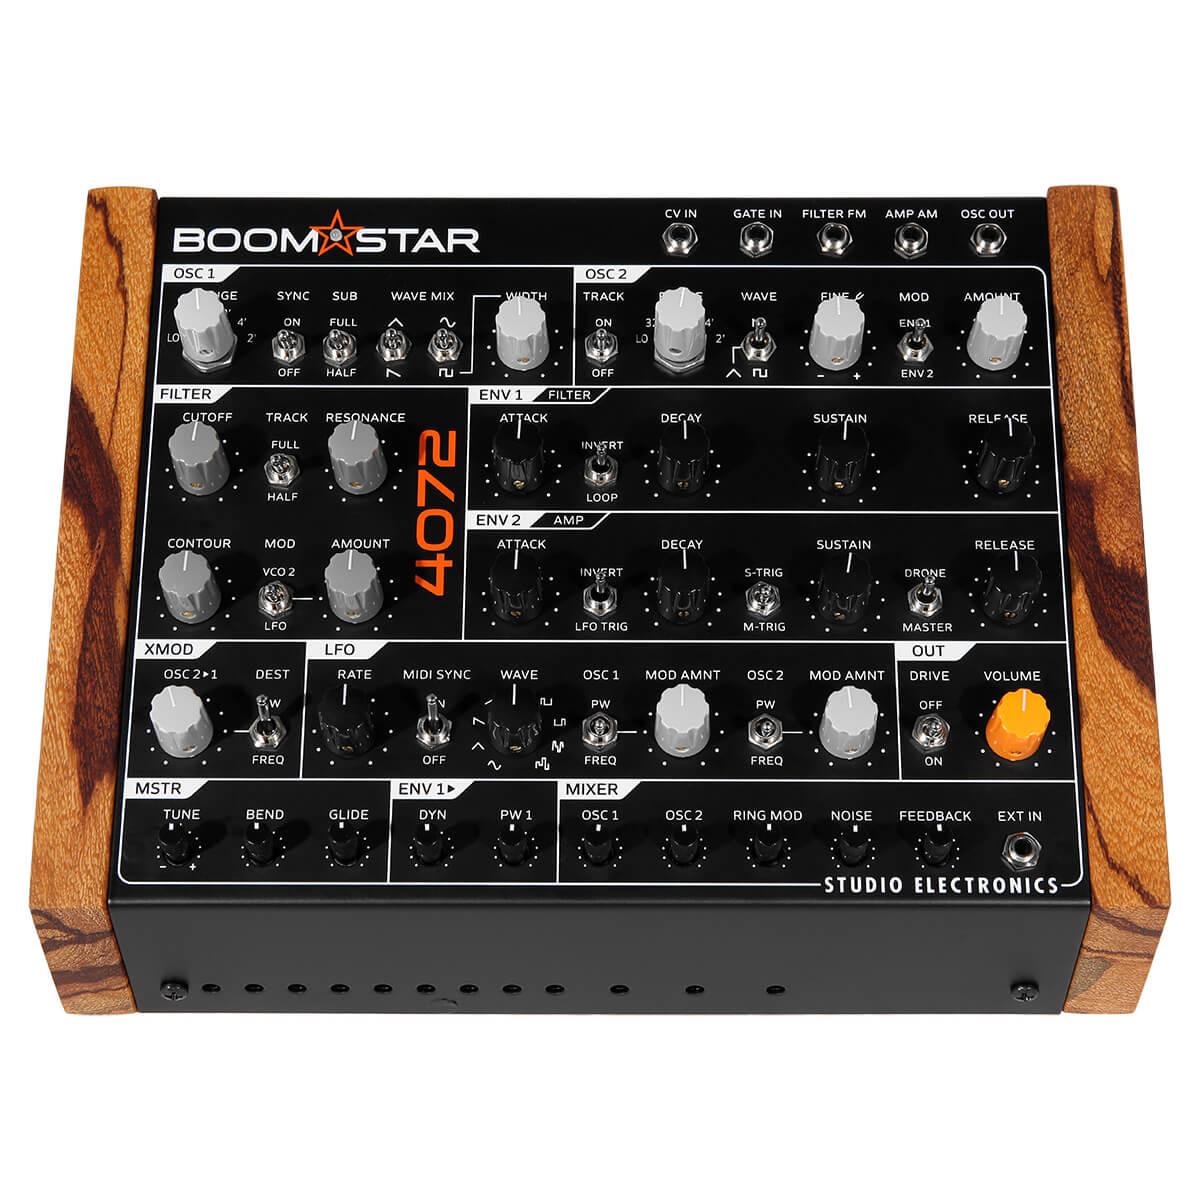 Boomstar MKII 4072 (Top)